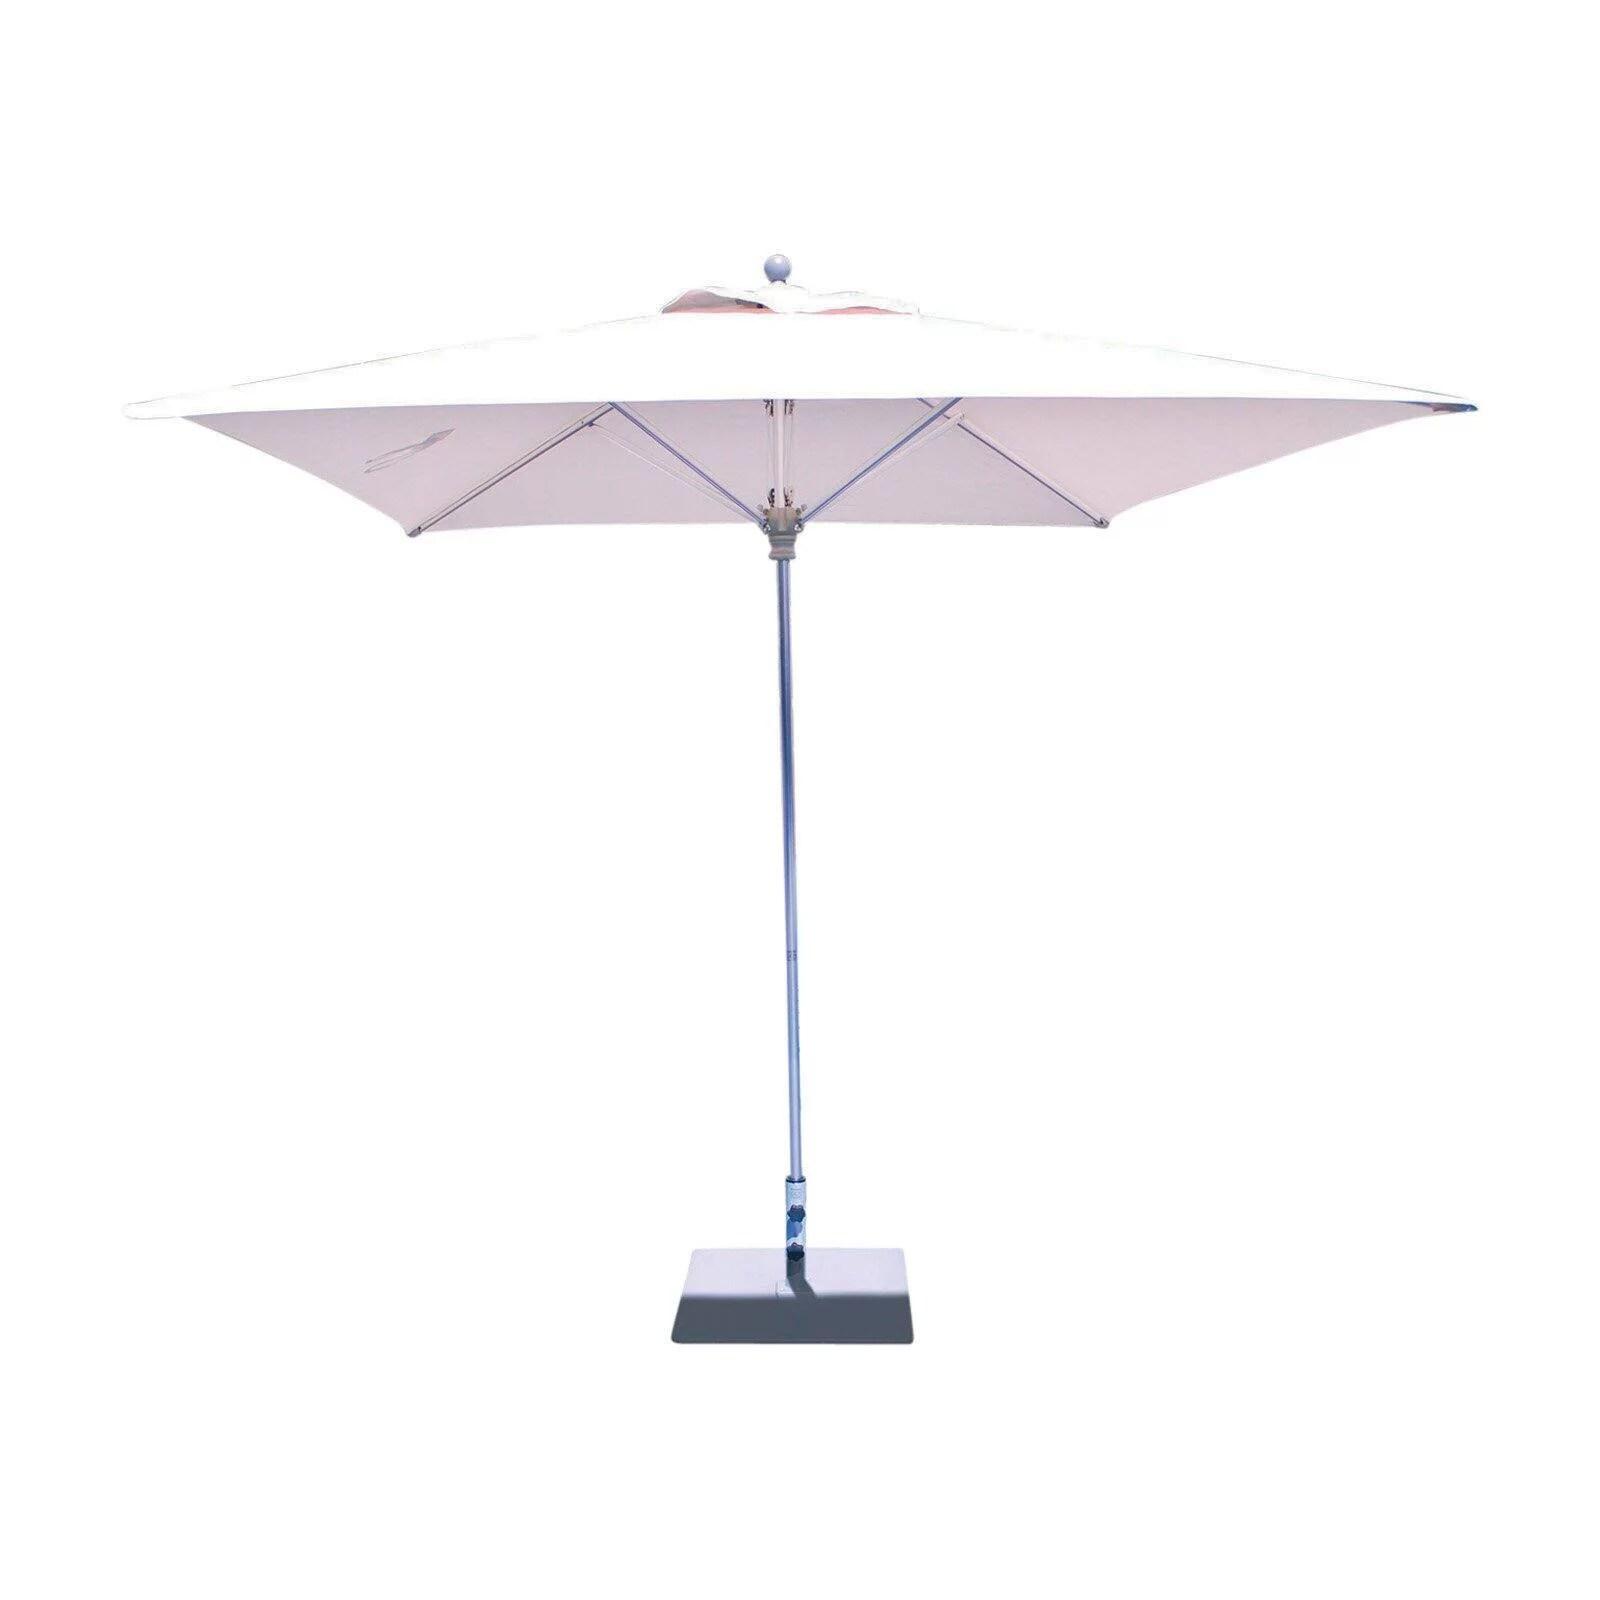 galtech 8 ft square deluxe sunbrella commercial aluminum patio umbrella walmart com